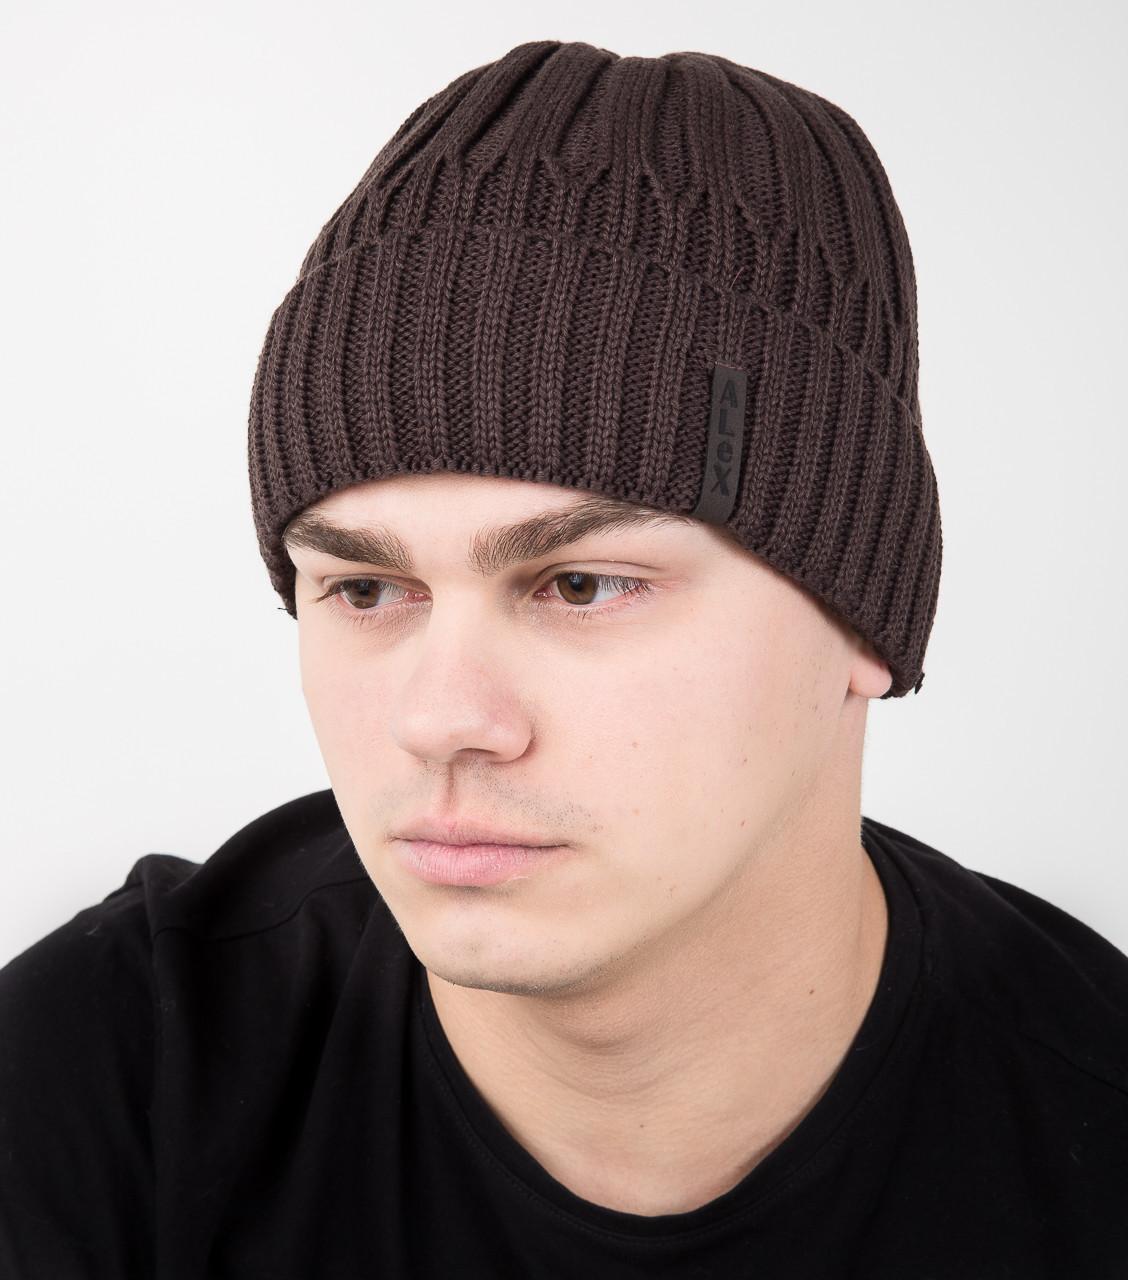 Шапка на флисе с отворотом для мужчин - Арт AL17029